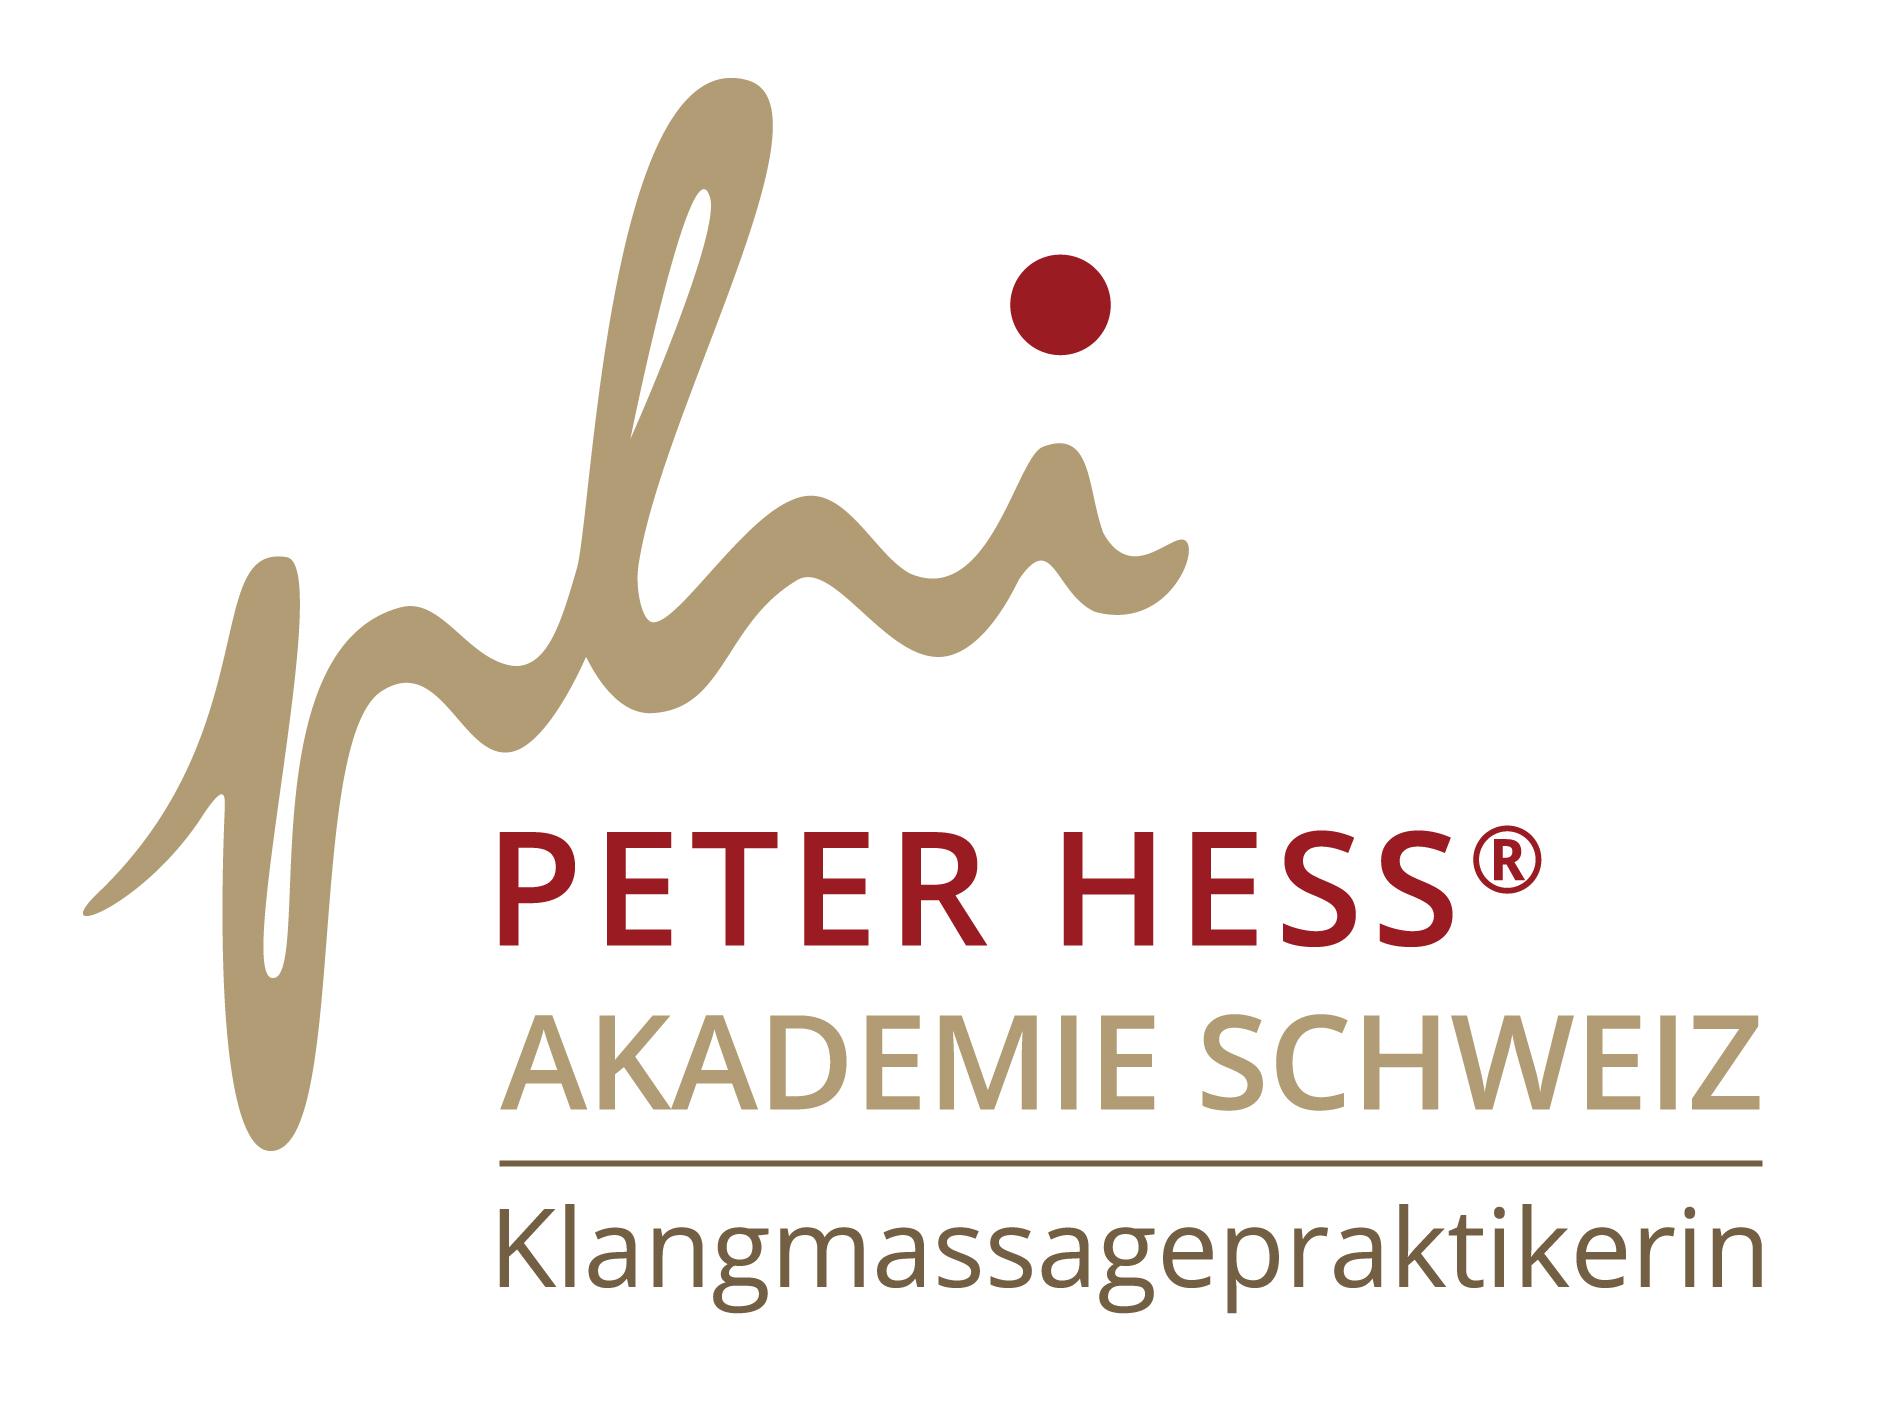 Logo_KM_Parktiker_w_Schweizjpg